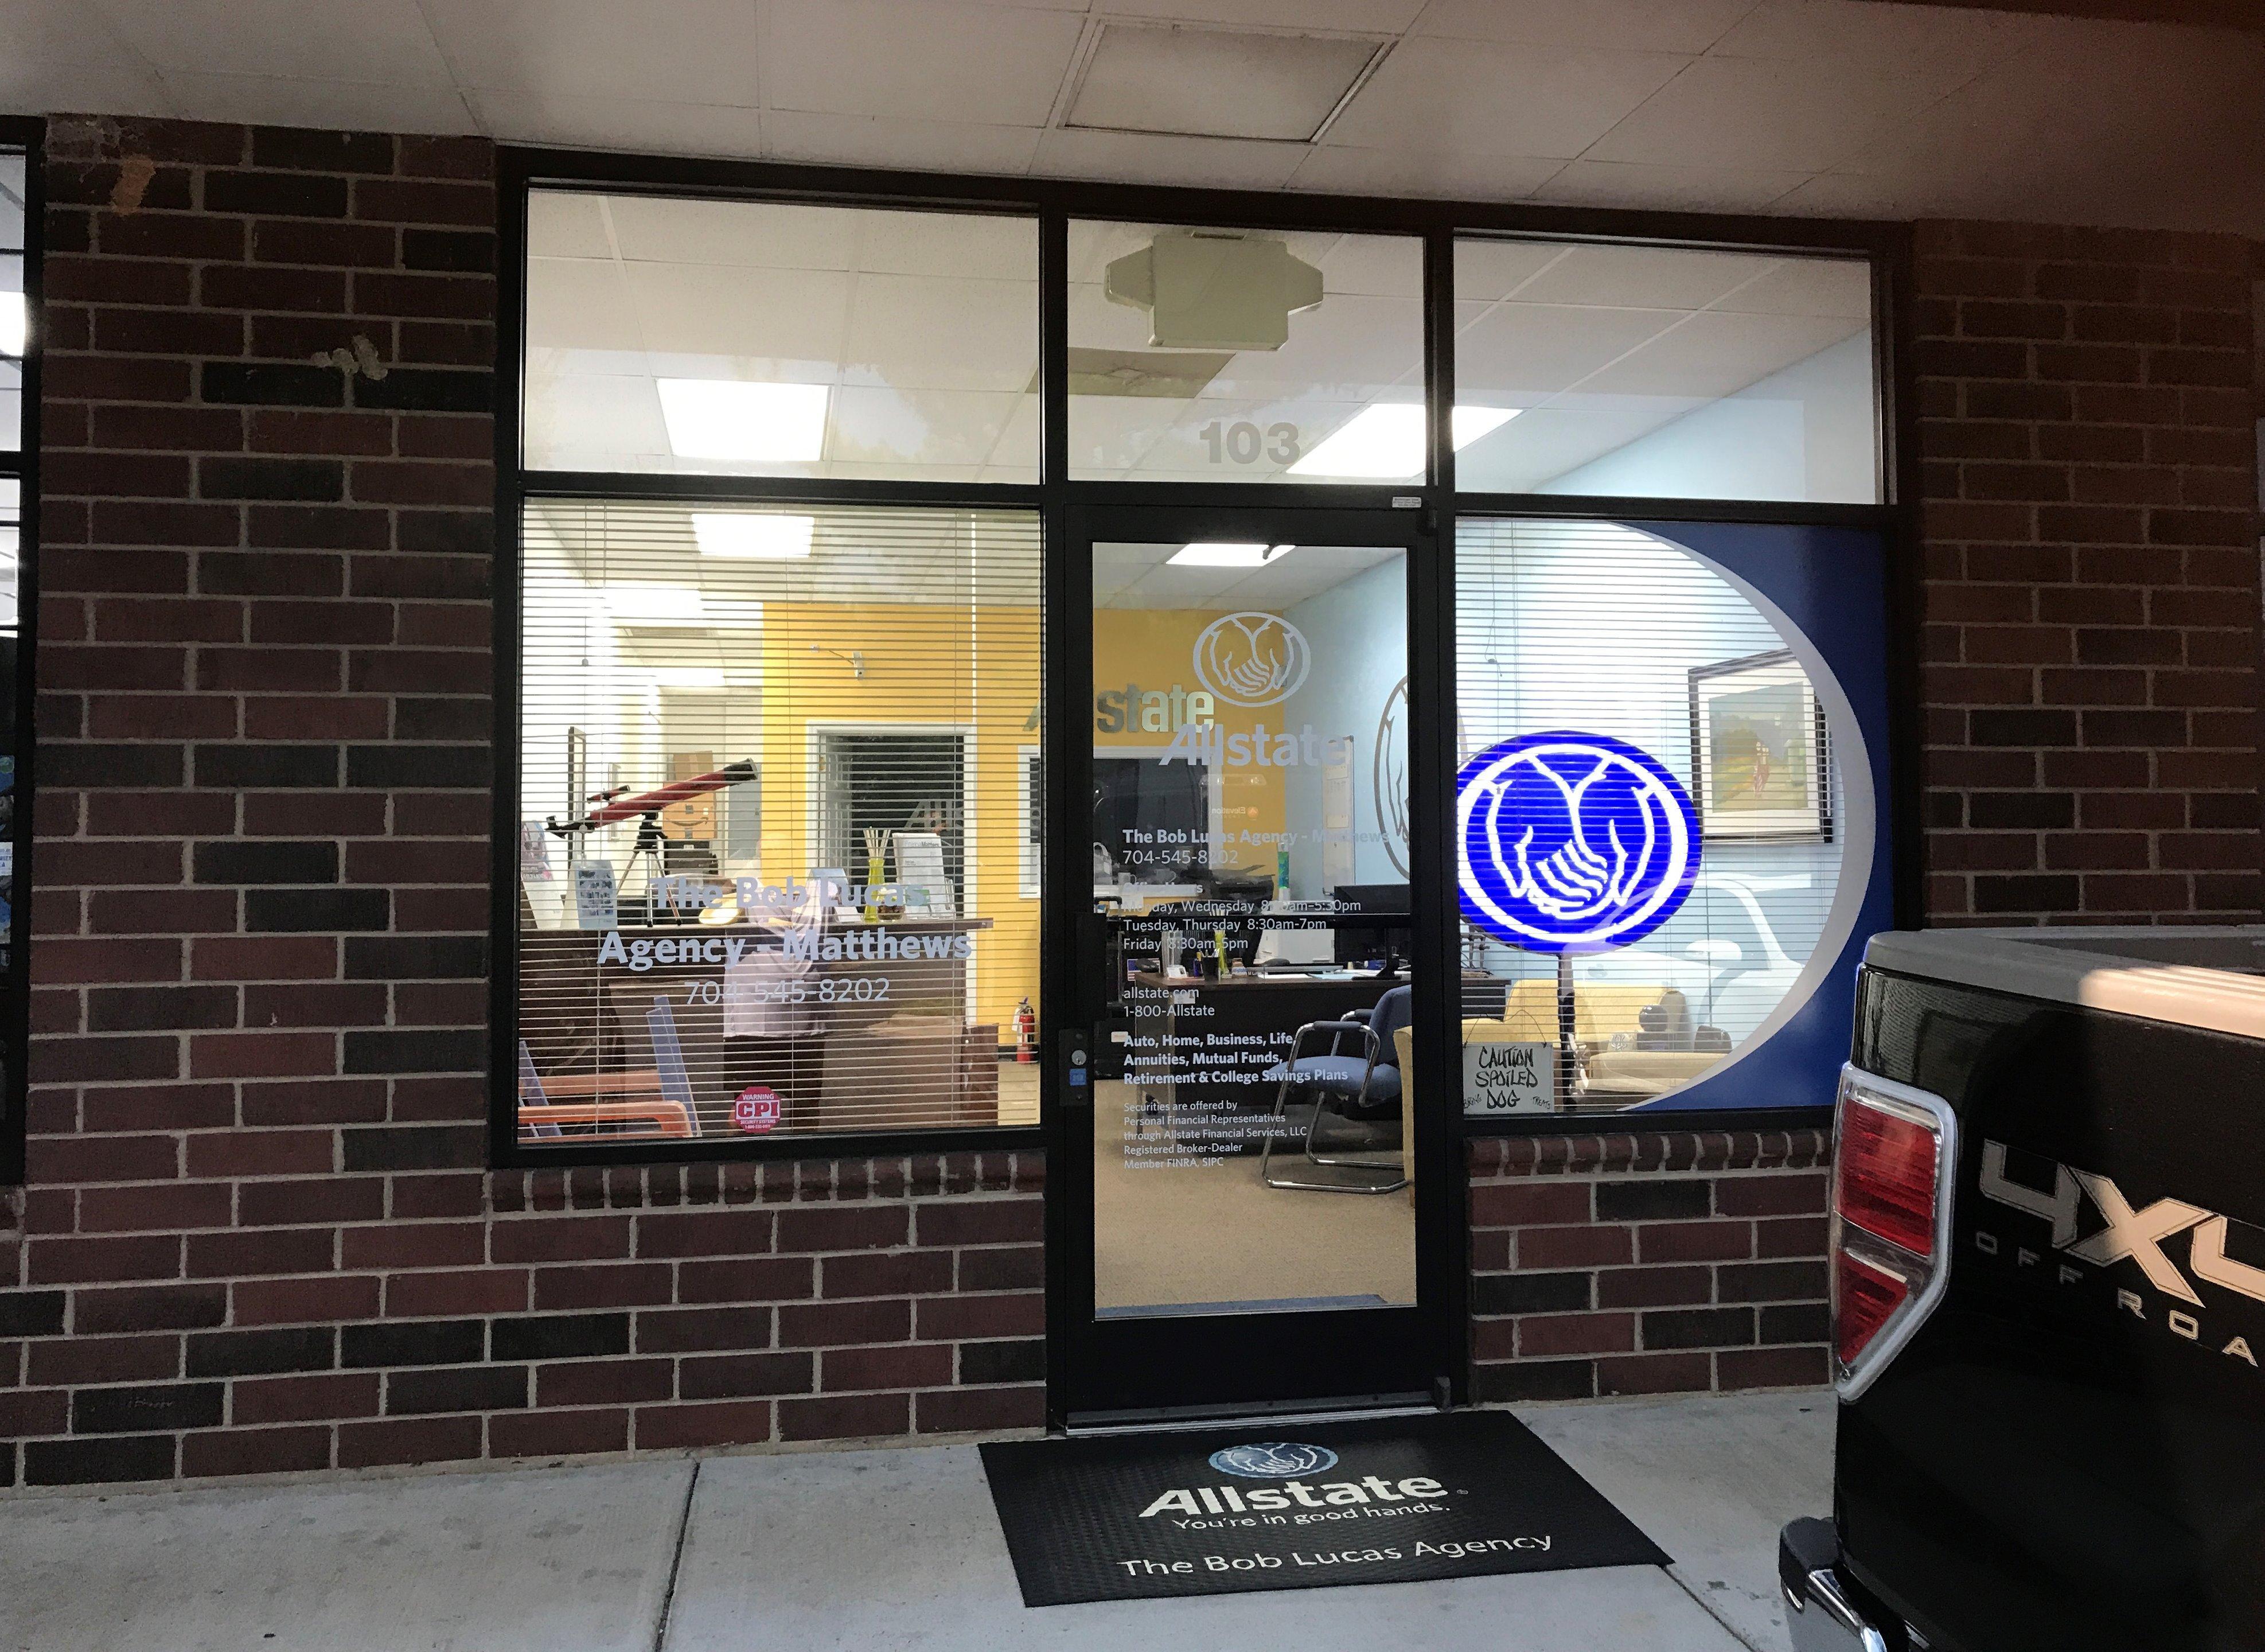 Robert Lucas: Allstate Insurance image 1